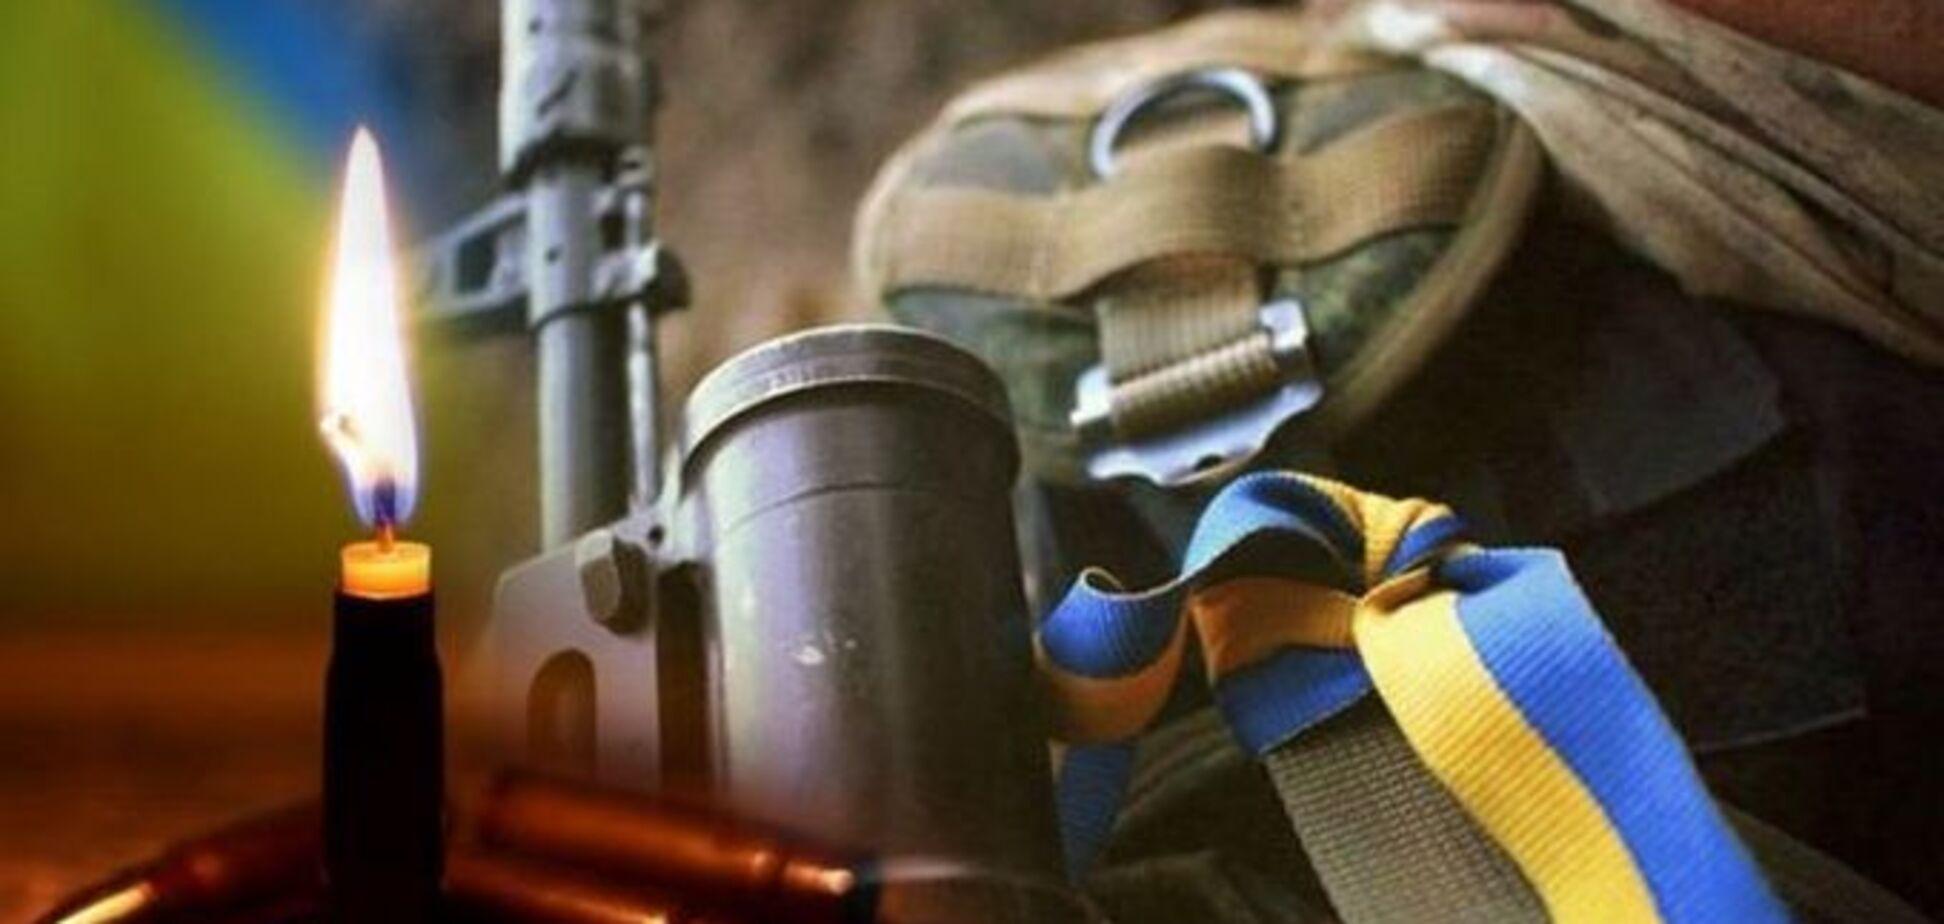 Почти сотня тел: ВСУ занялись погибшими на Донбассе украинцами